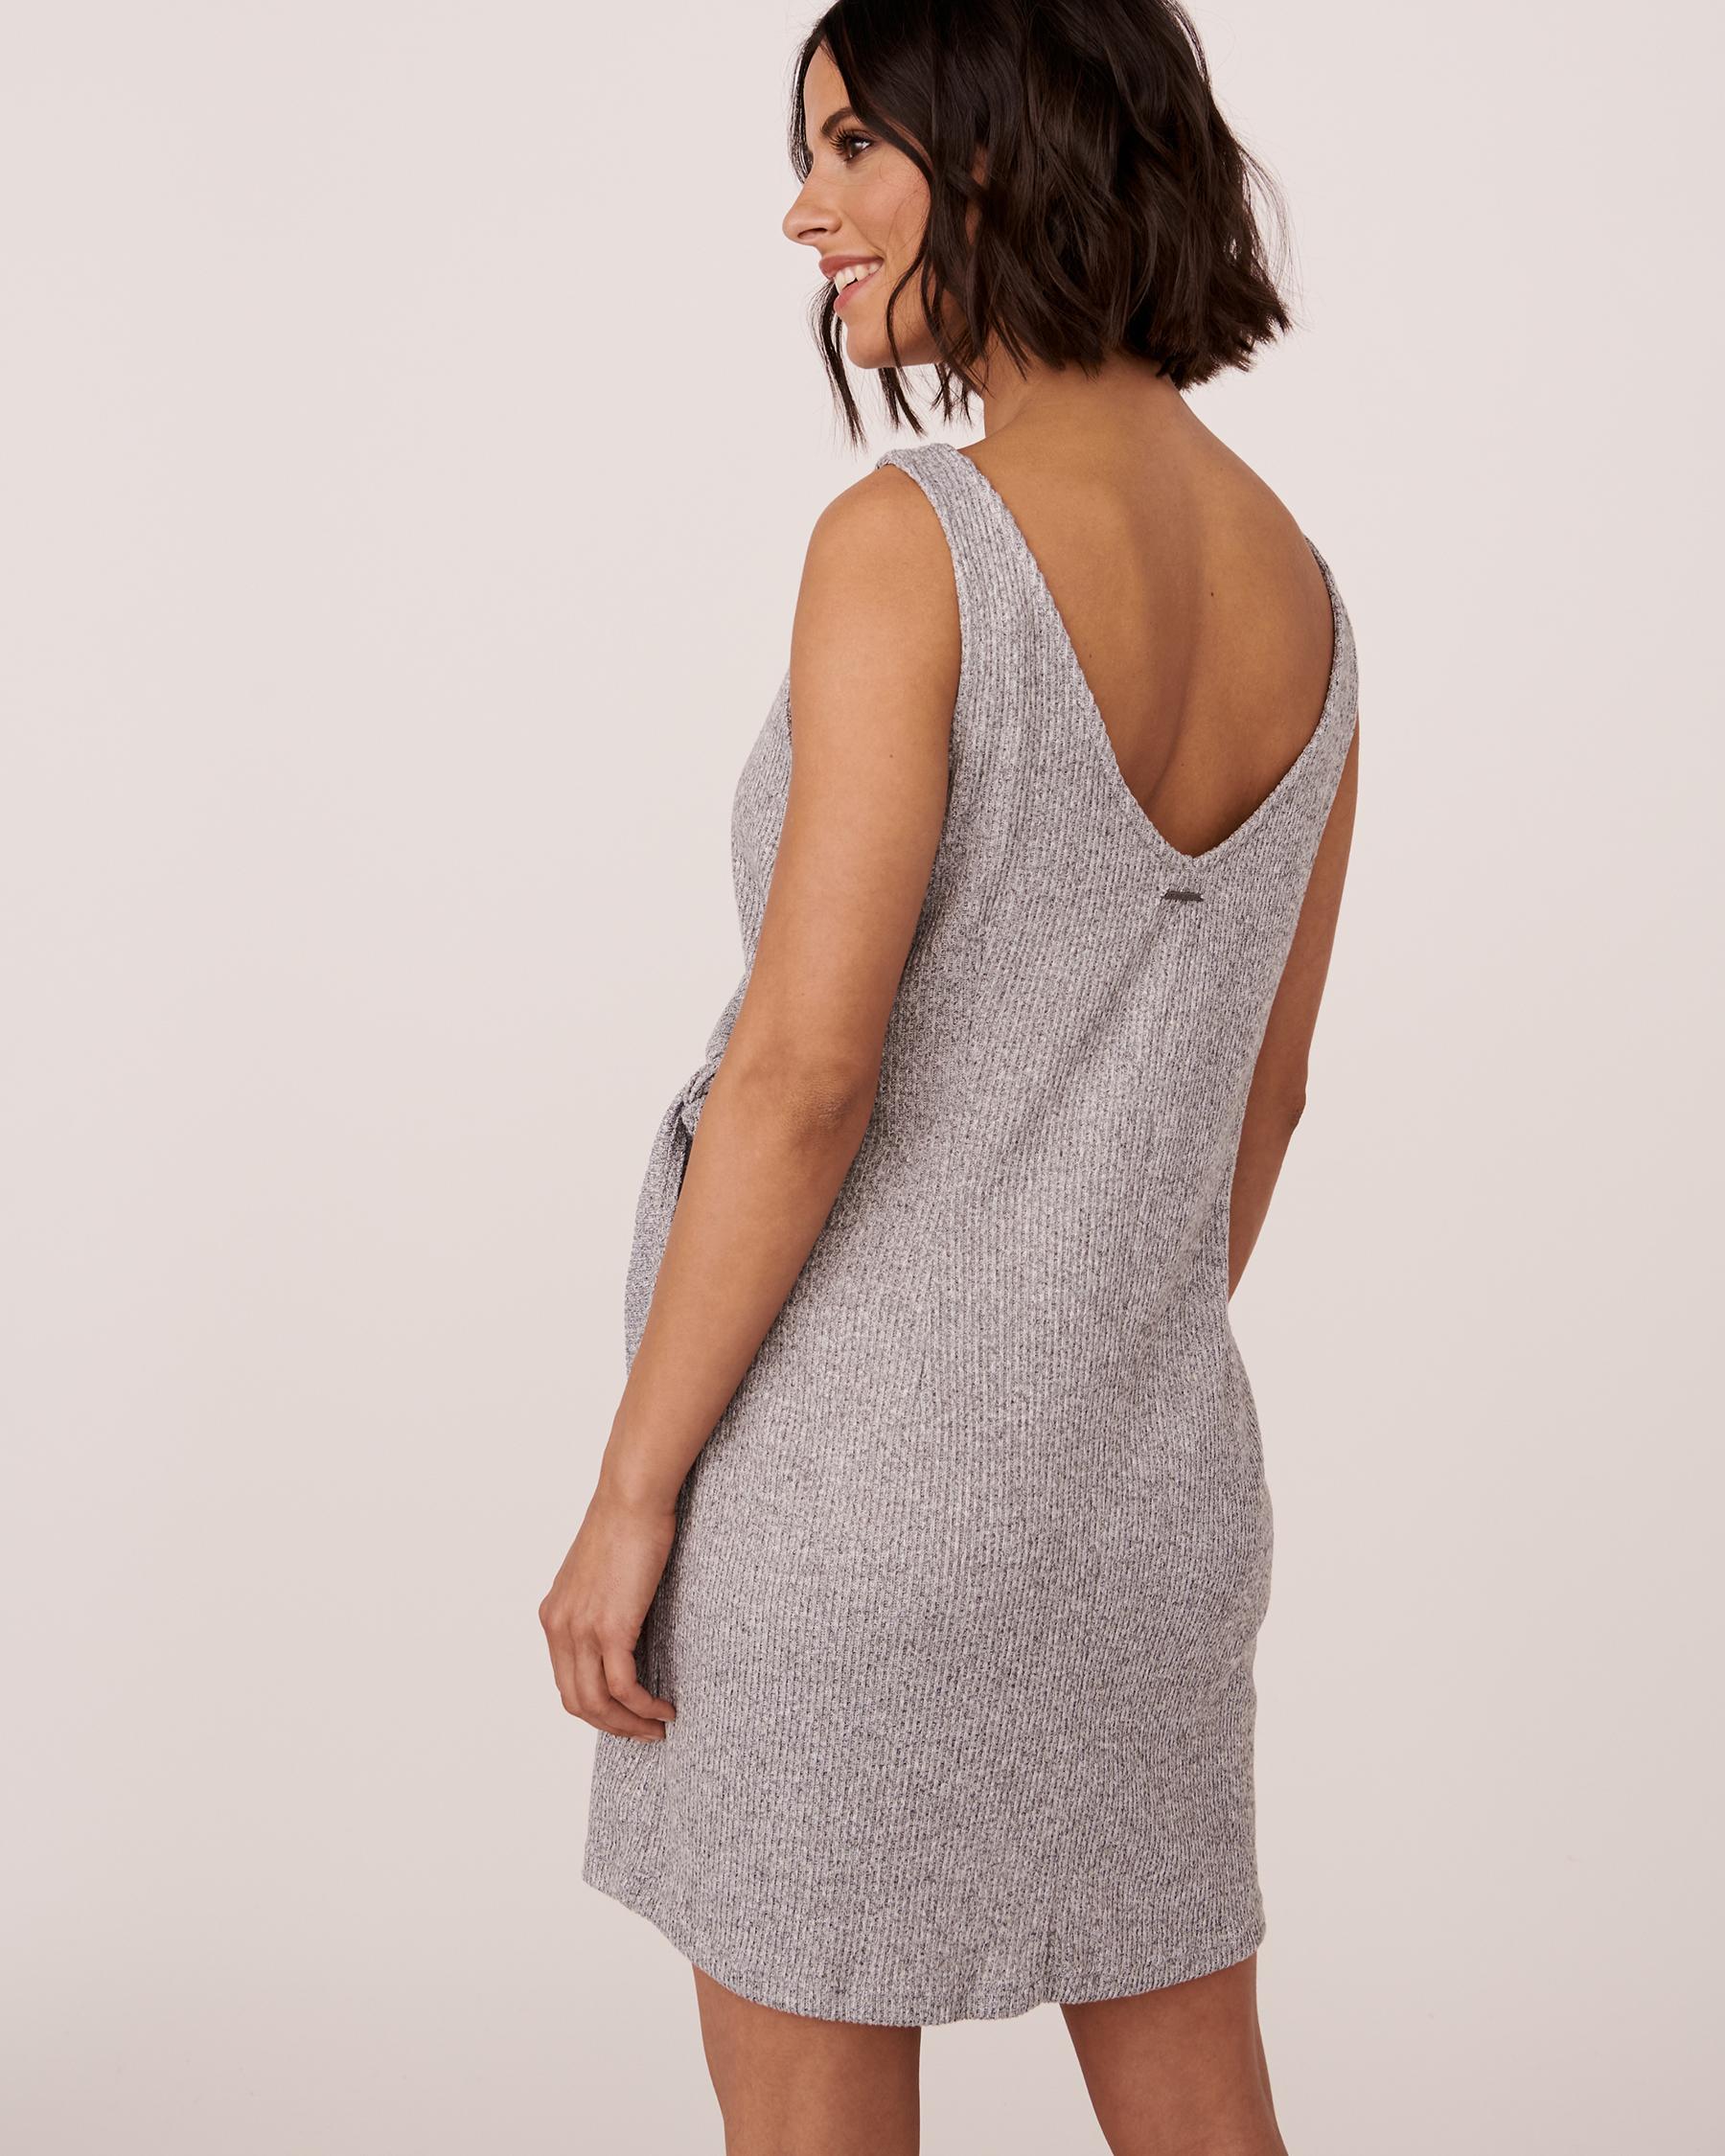 LA VIE EN ROSE Ribbed V-neckline Dress Grey 774-474-0-04 - View2